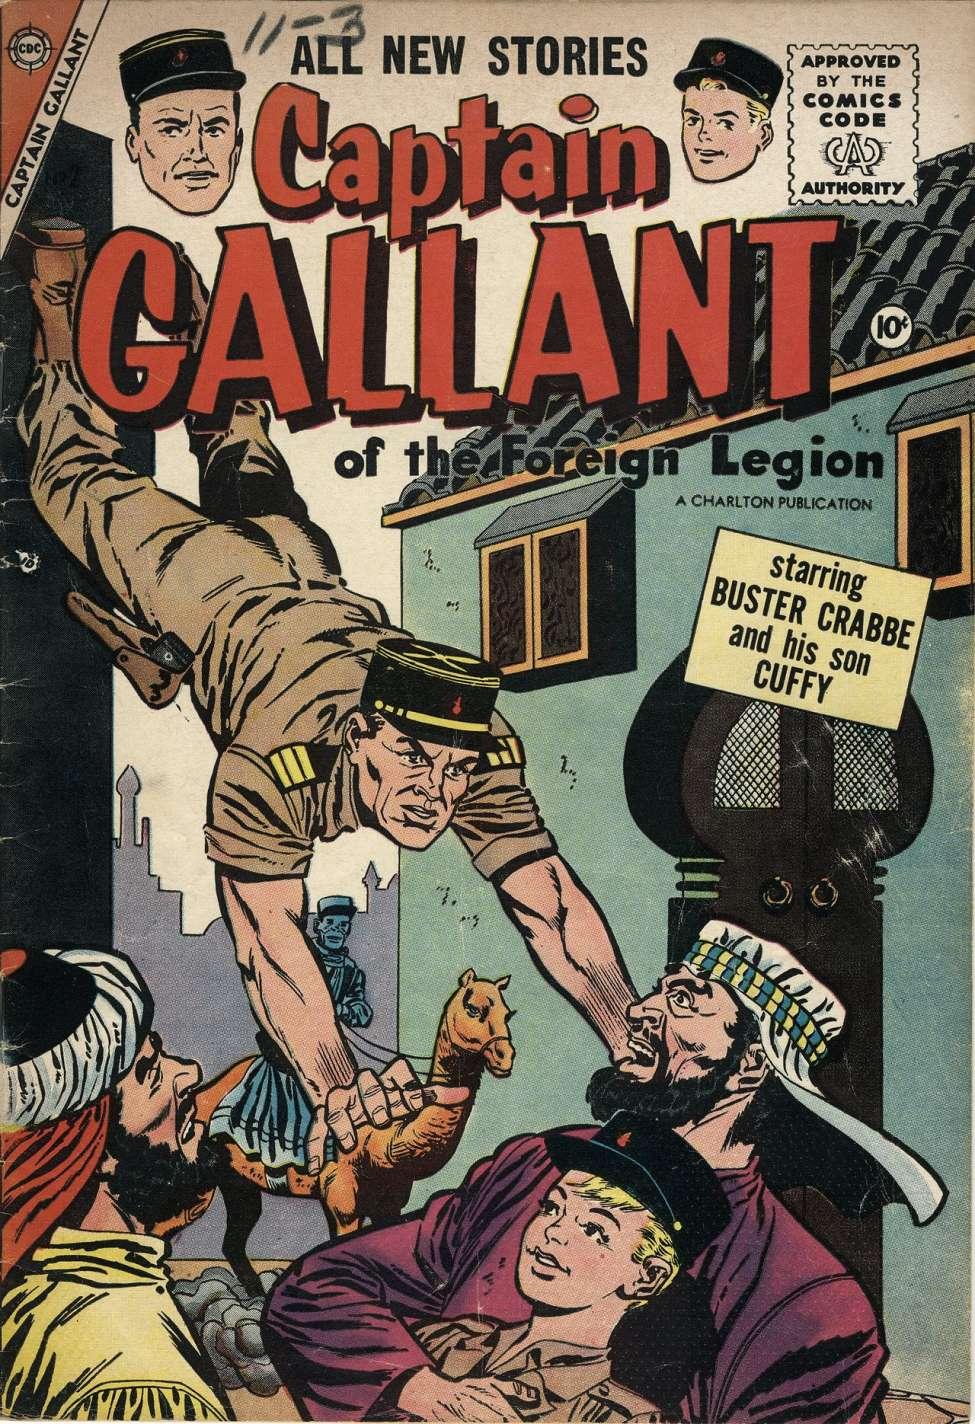 Captain Gallant Vol 1 2